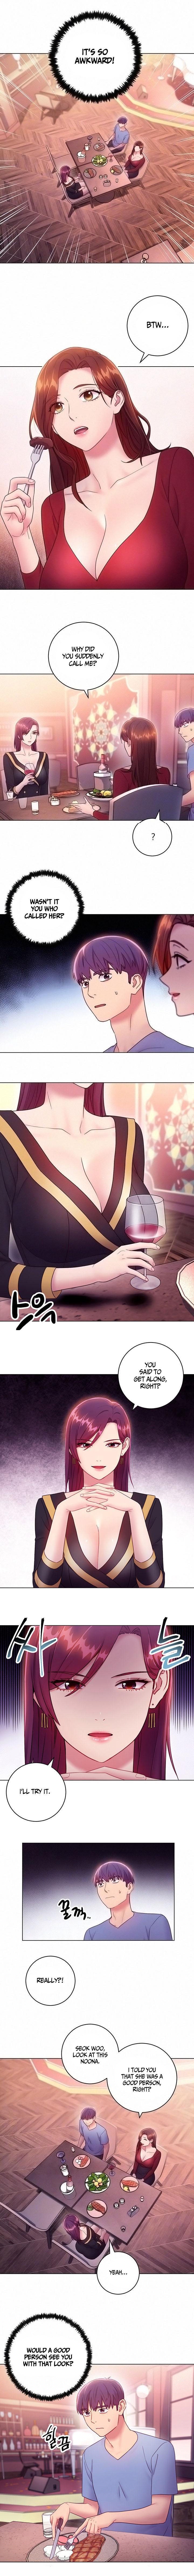 [Neck Pilllow] Stepmother Friends Ch.39/? [English] [Hentai Universe] NEW! 13/10/2020 328